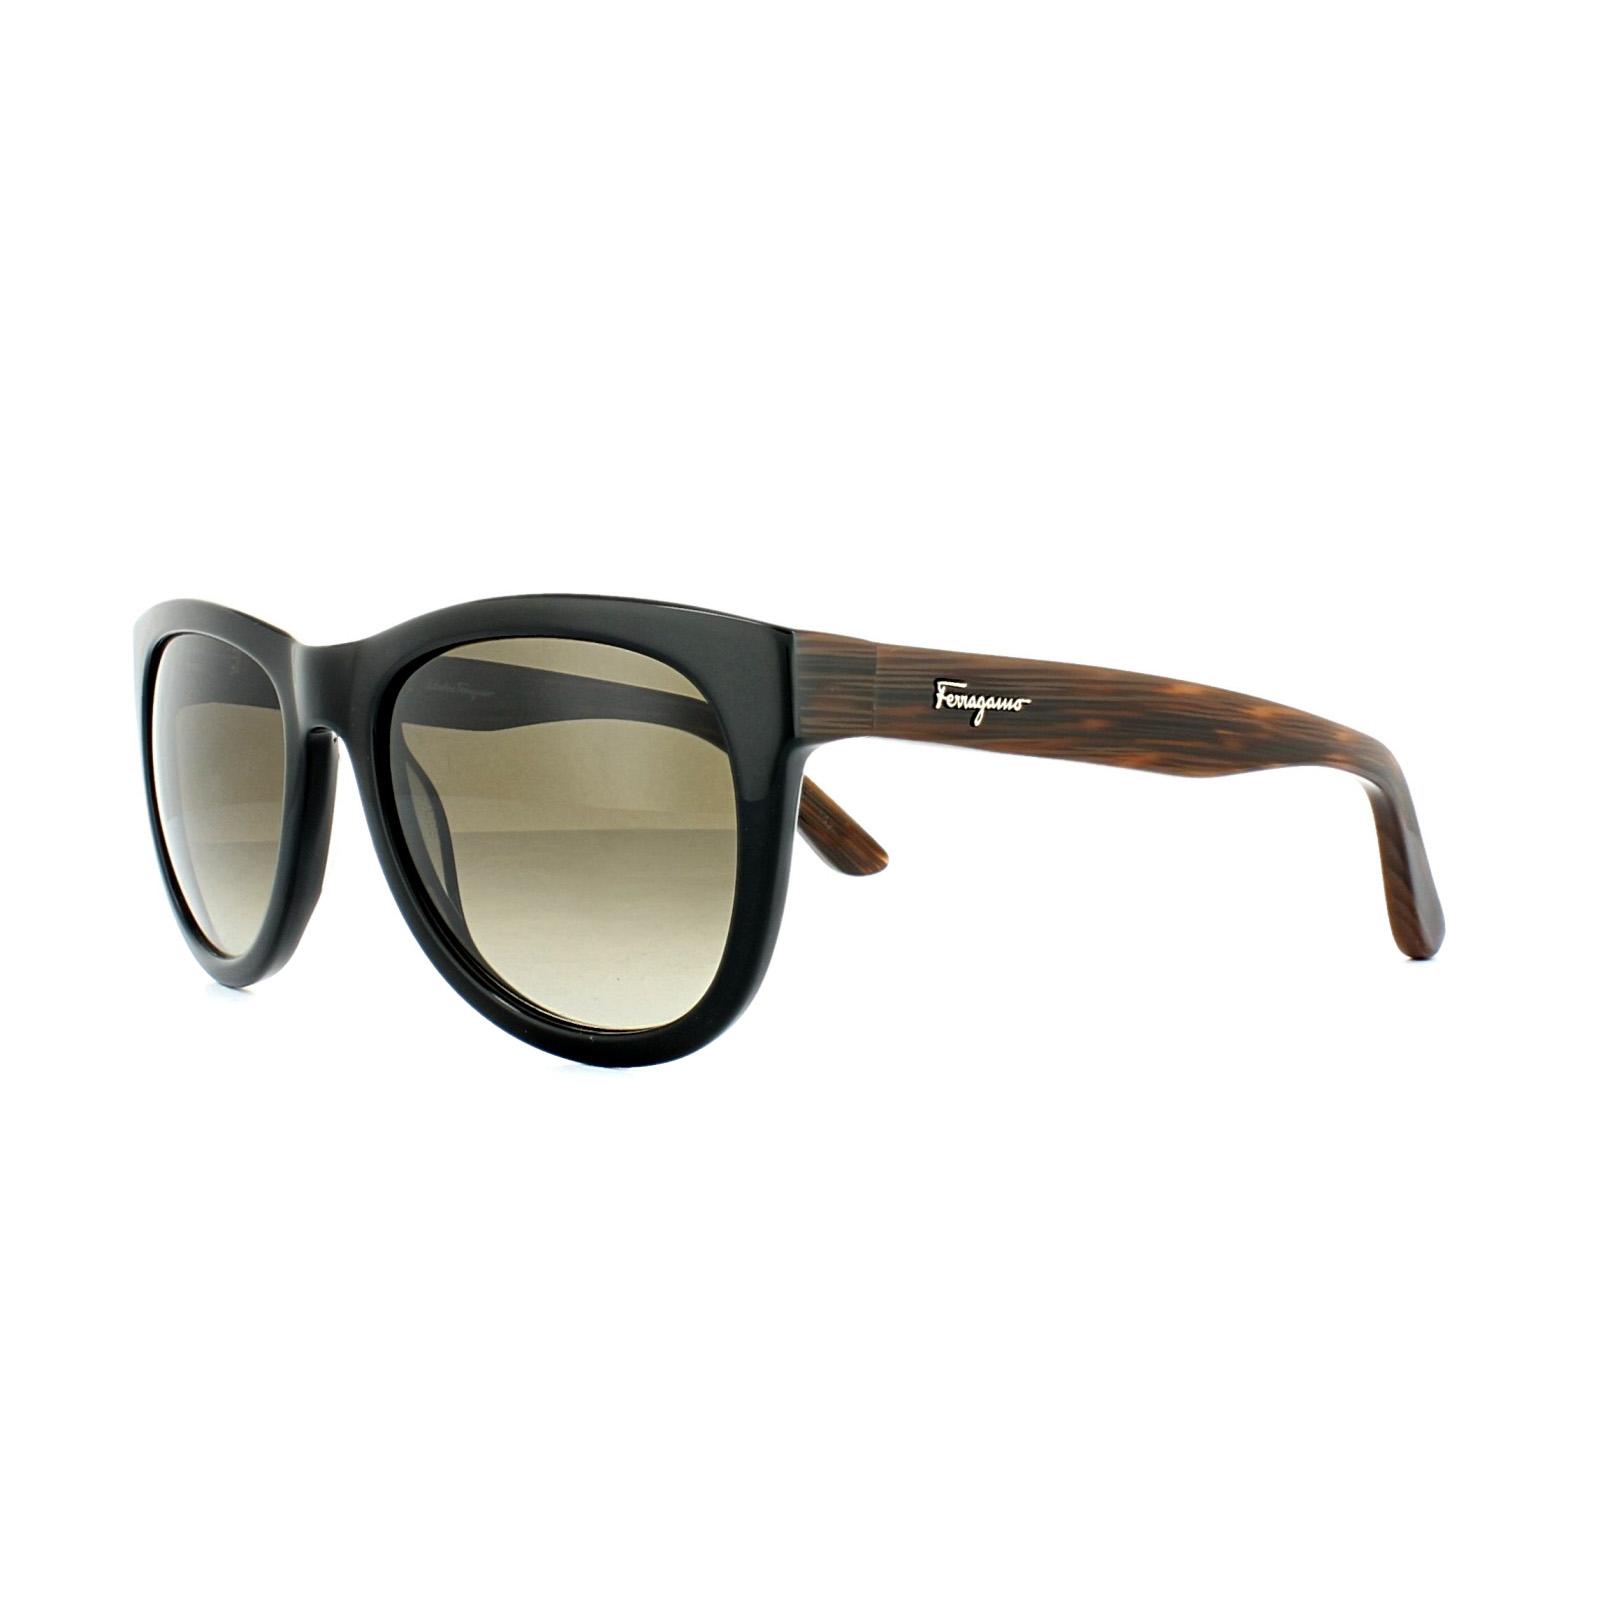 d37c9284d6 Sentinel Salvatore Ferragamo Sunglasses SF685S 001 Black   Brown Woodgrain  Grey Gradient